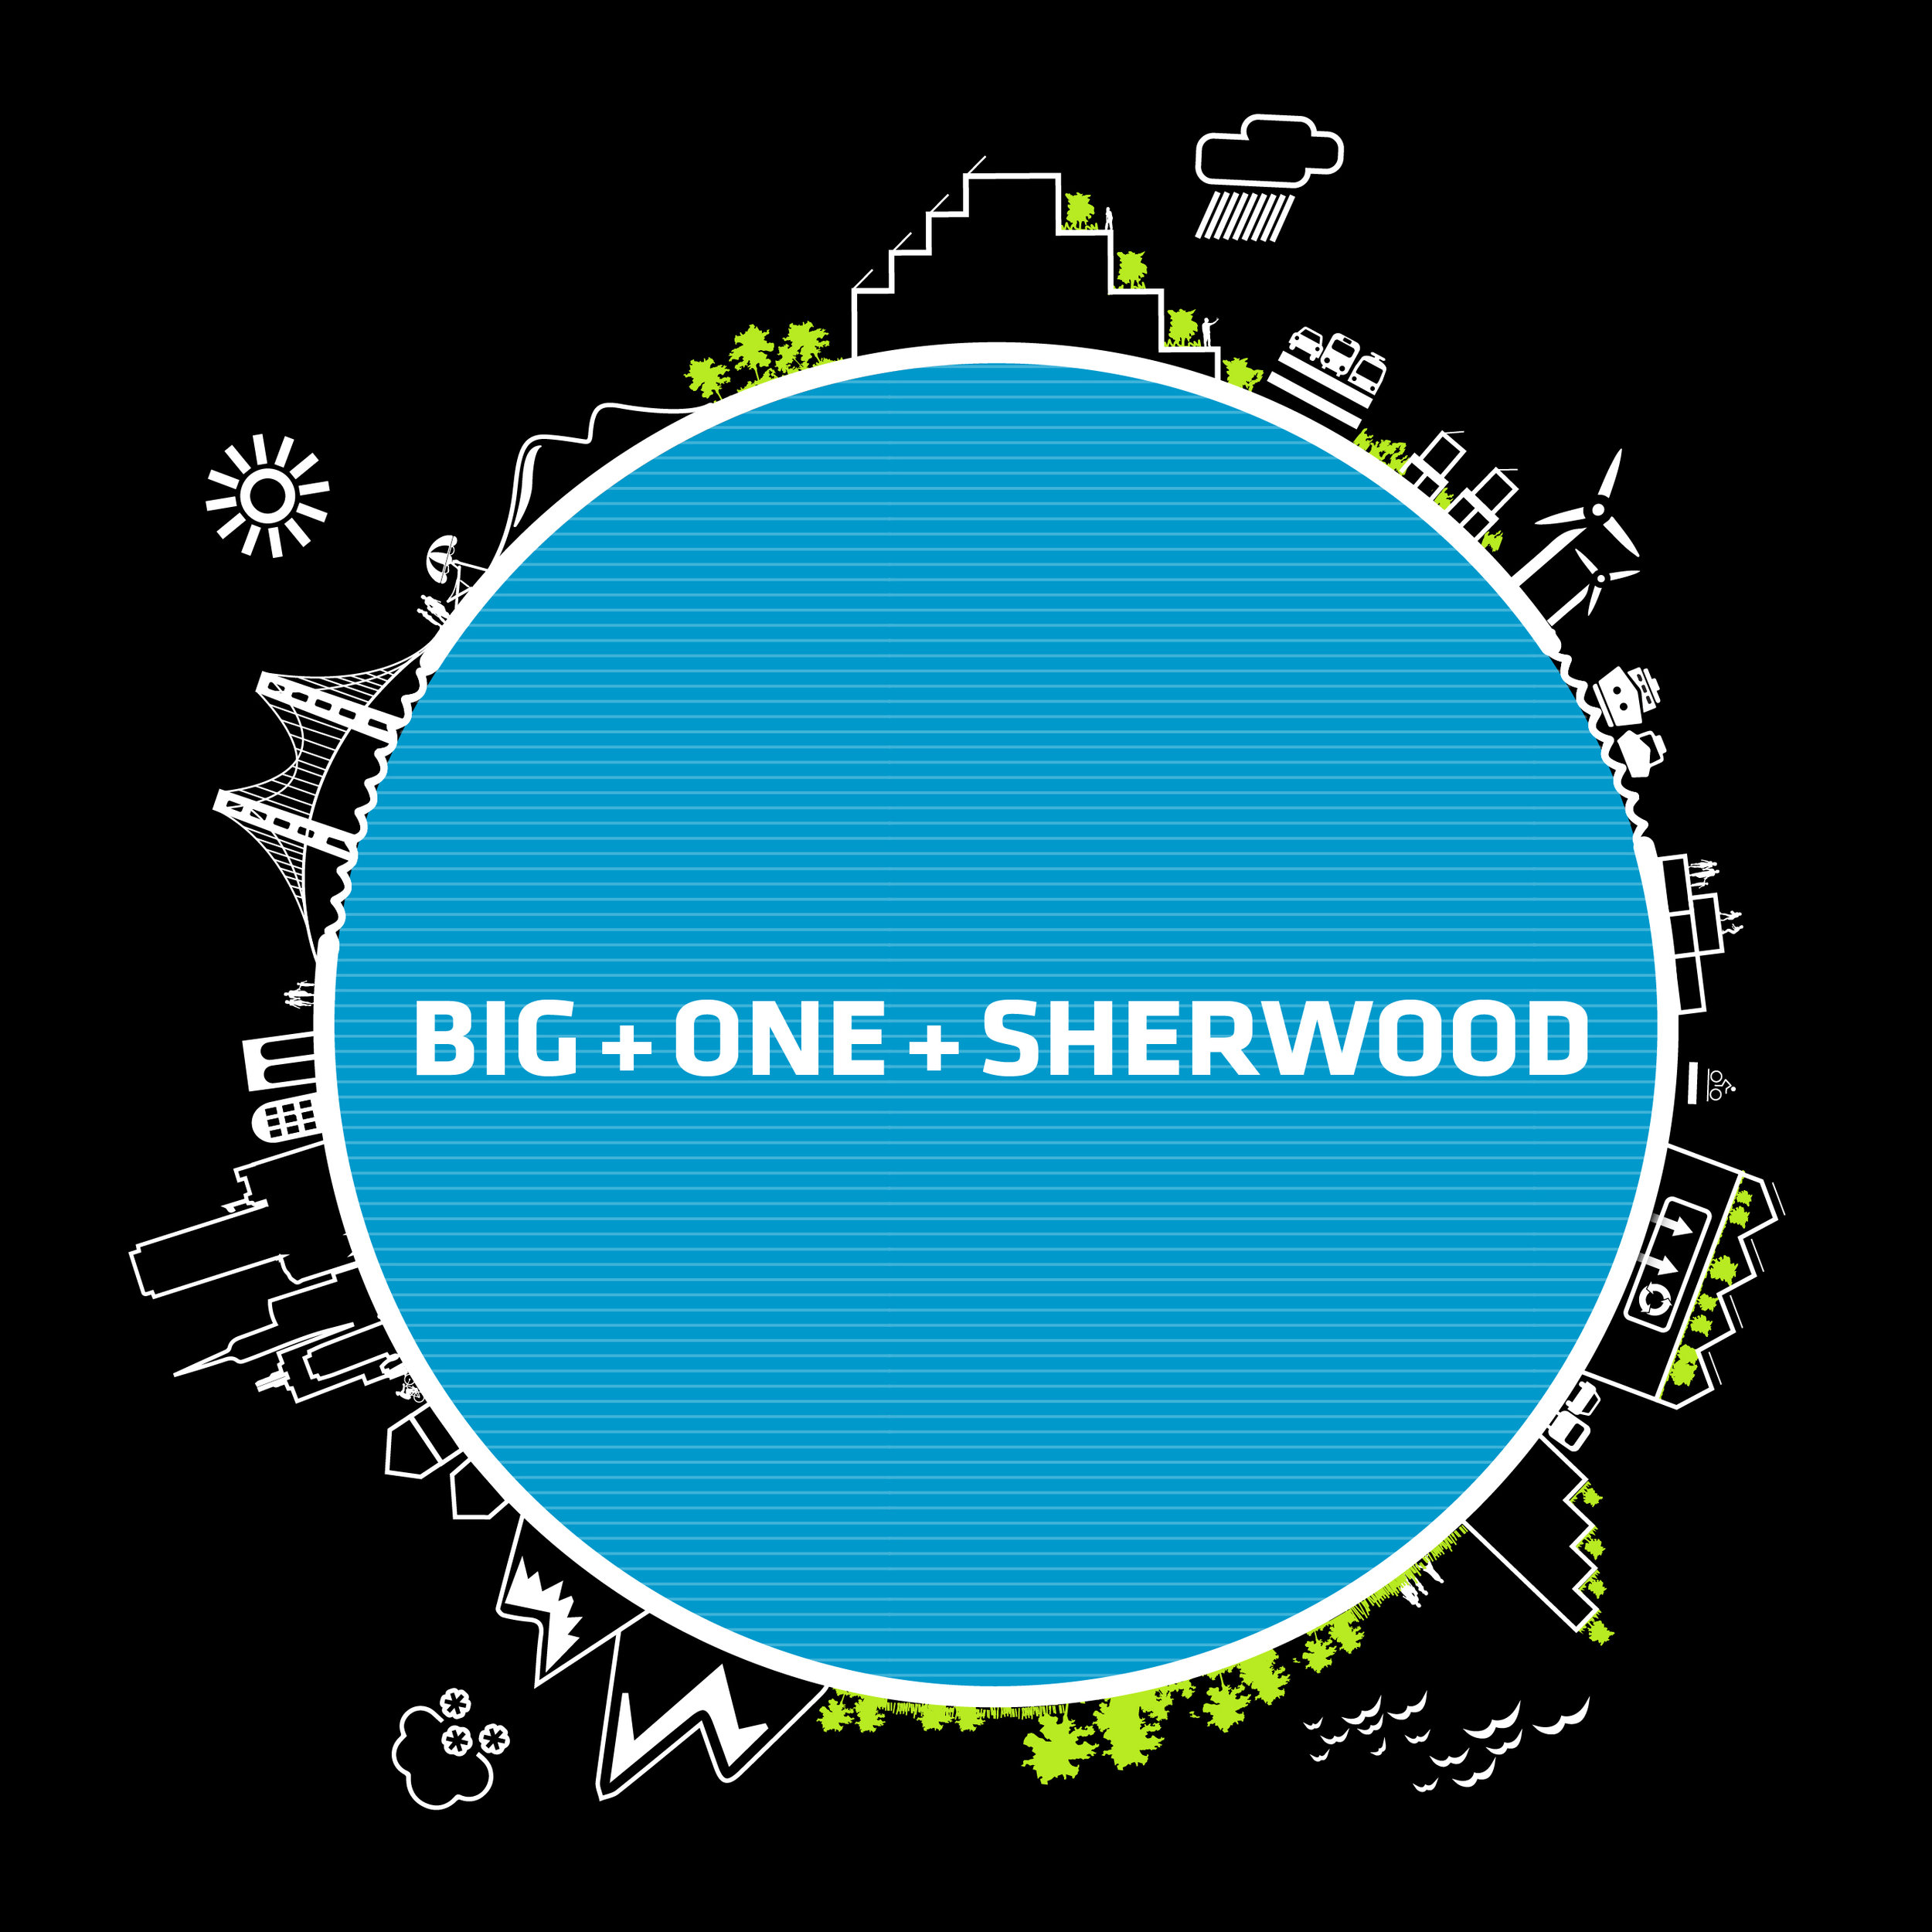 BIG + ONE + SHERWOOD - BIG